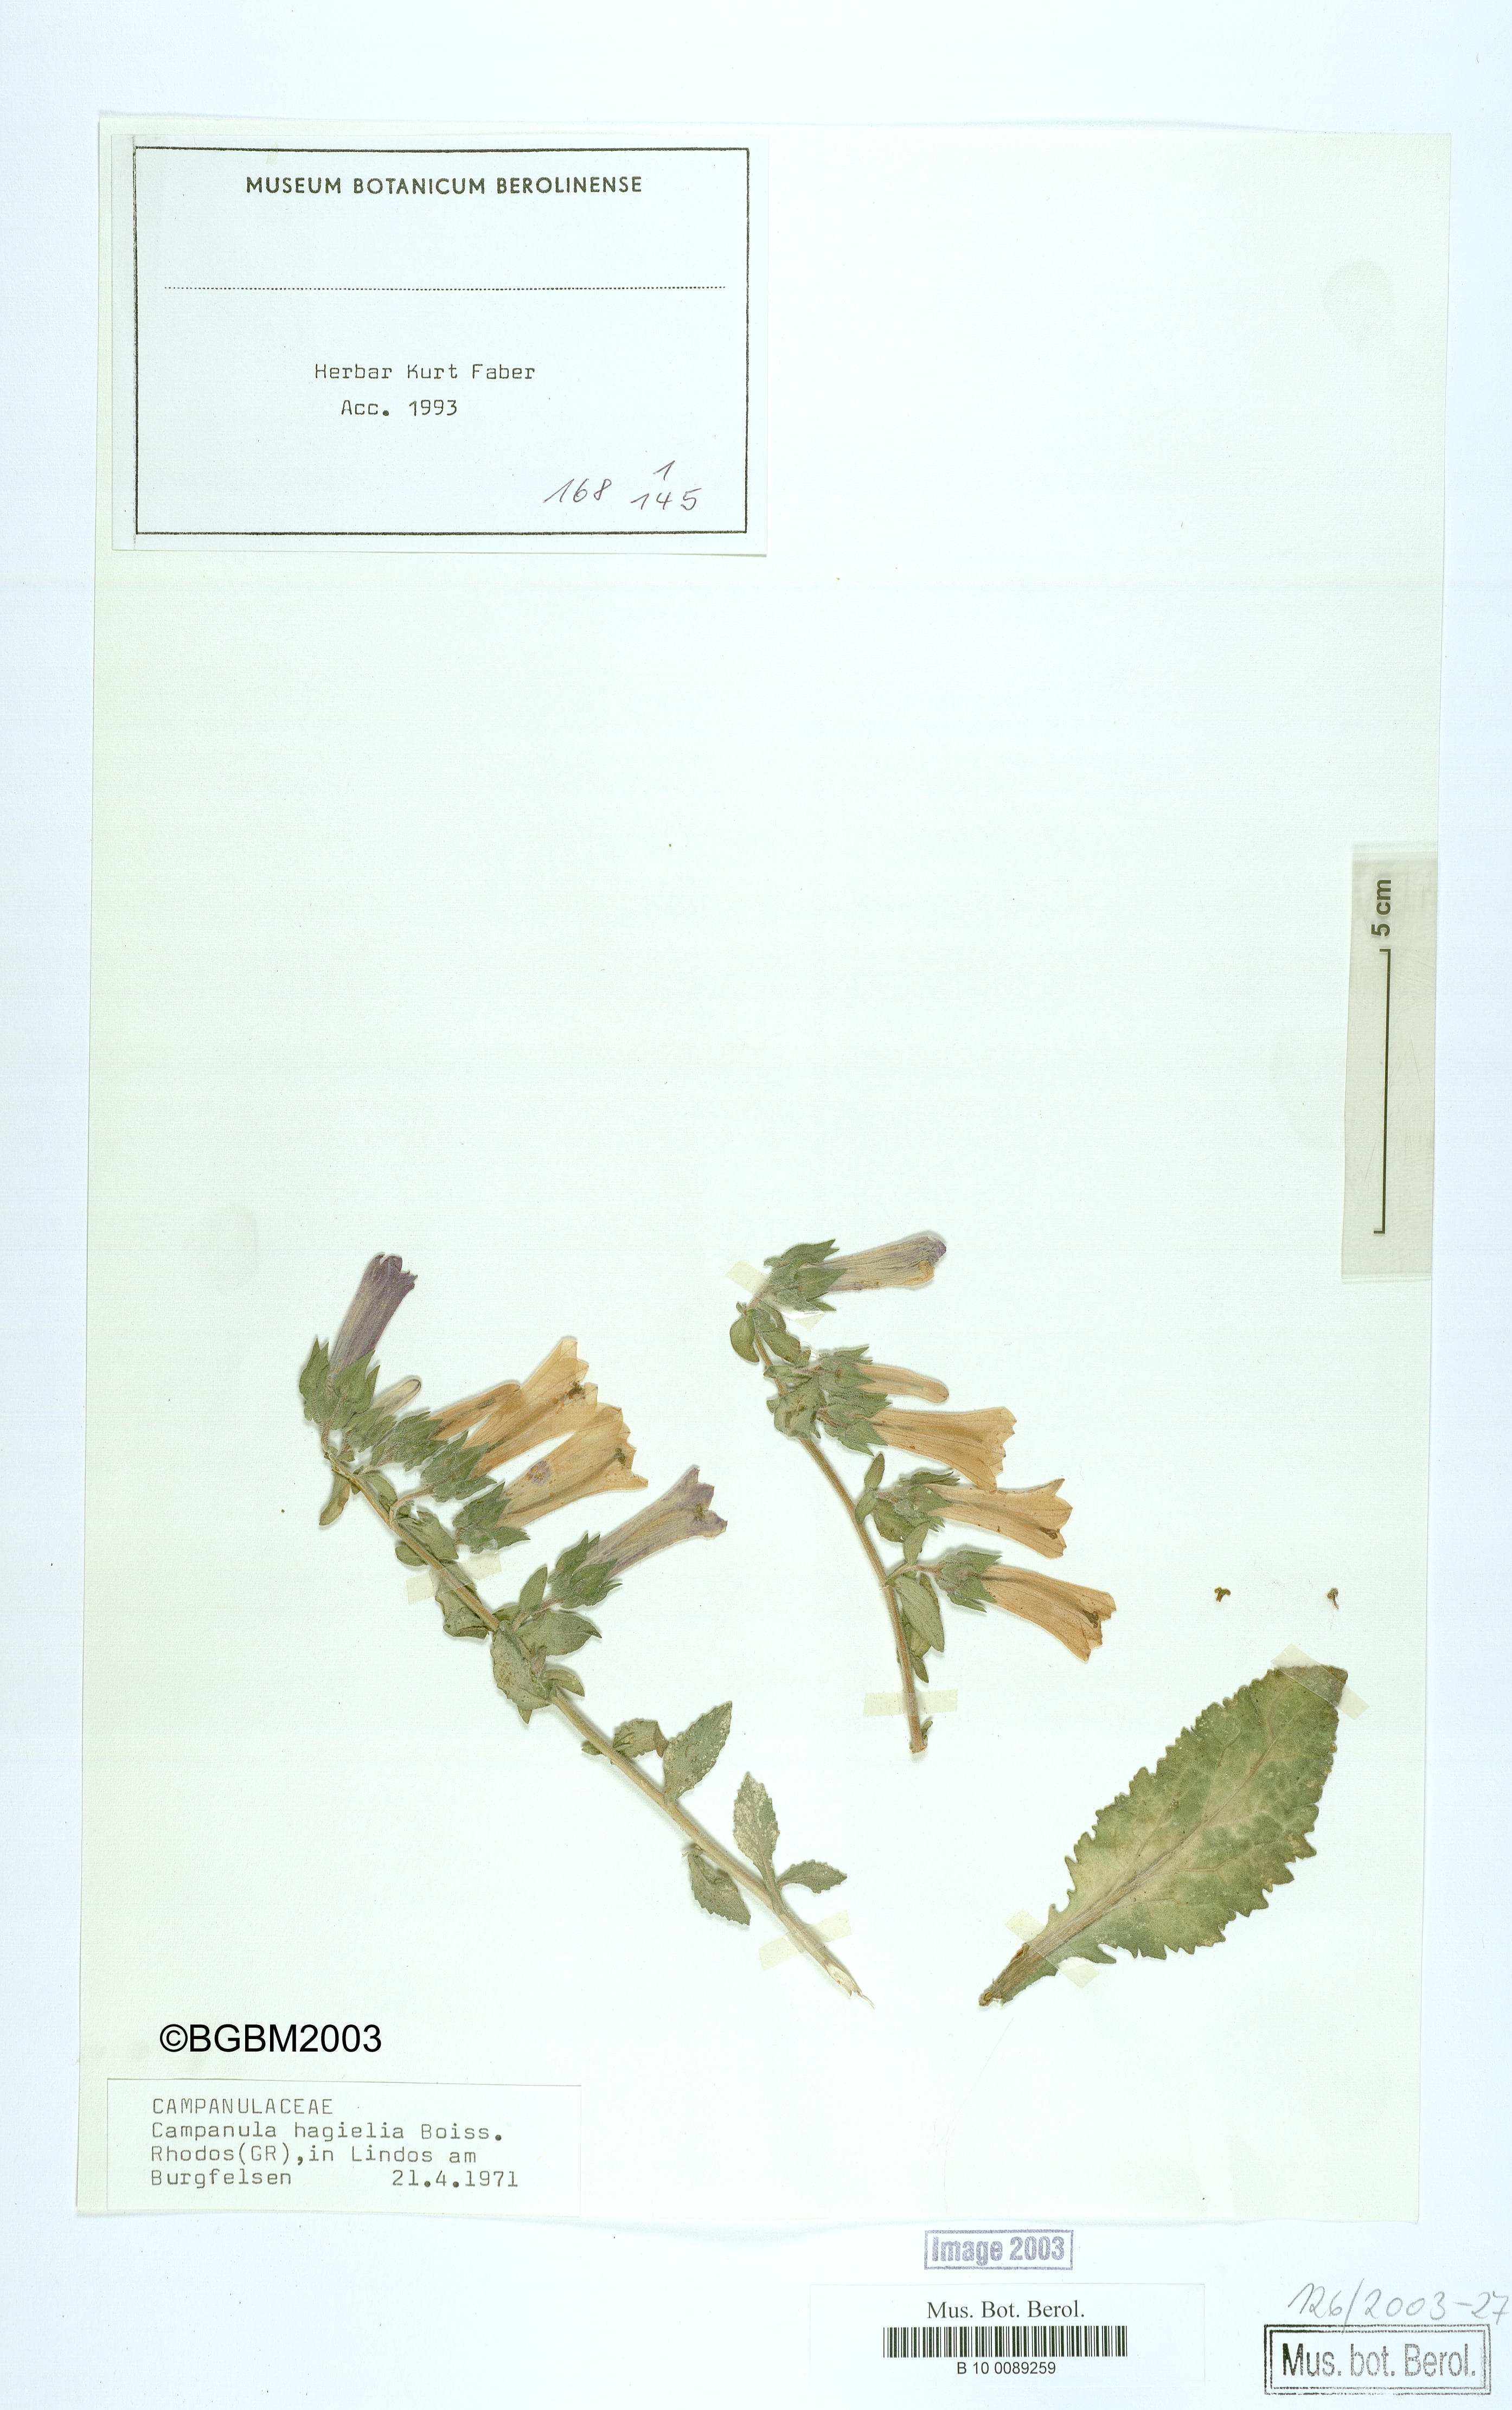 http://ww2.bgbm.org/herbarium/images/B/10/00/89/25/B_10_0089259.jpg